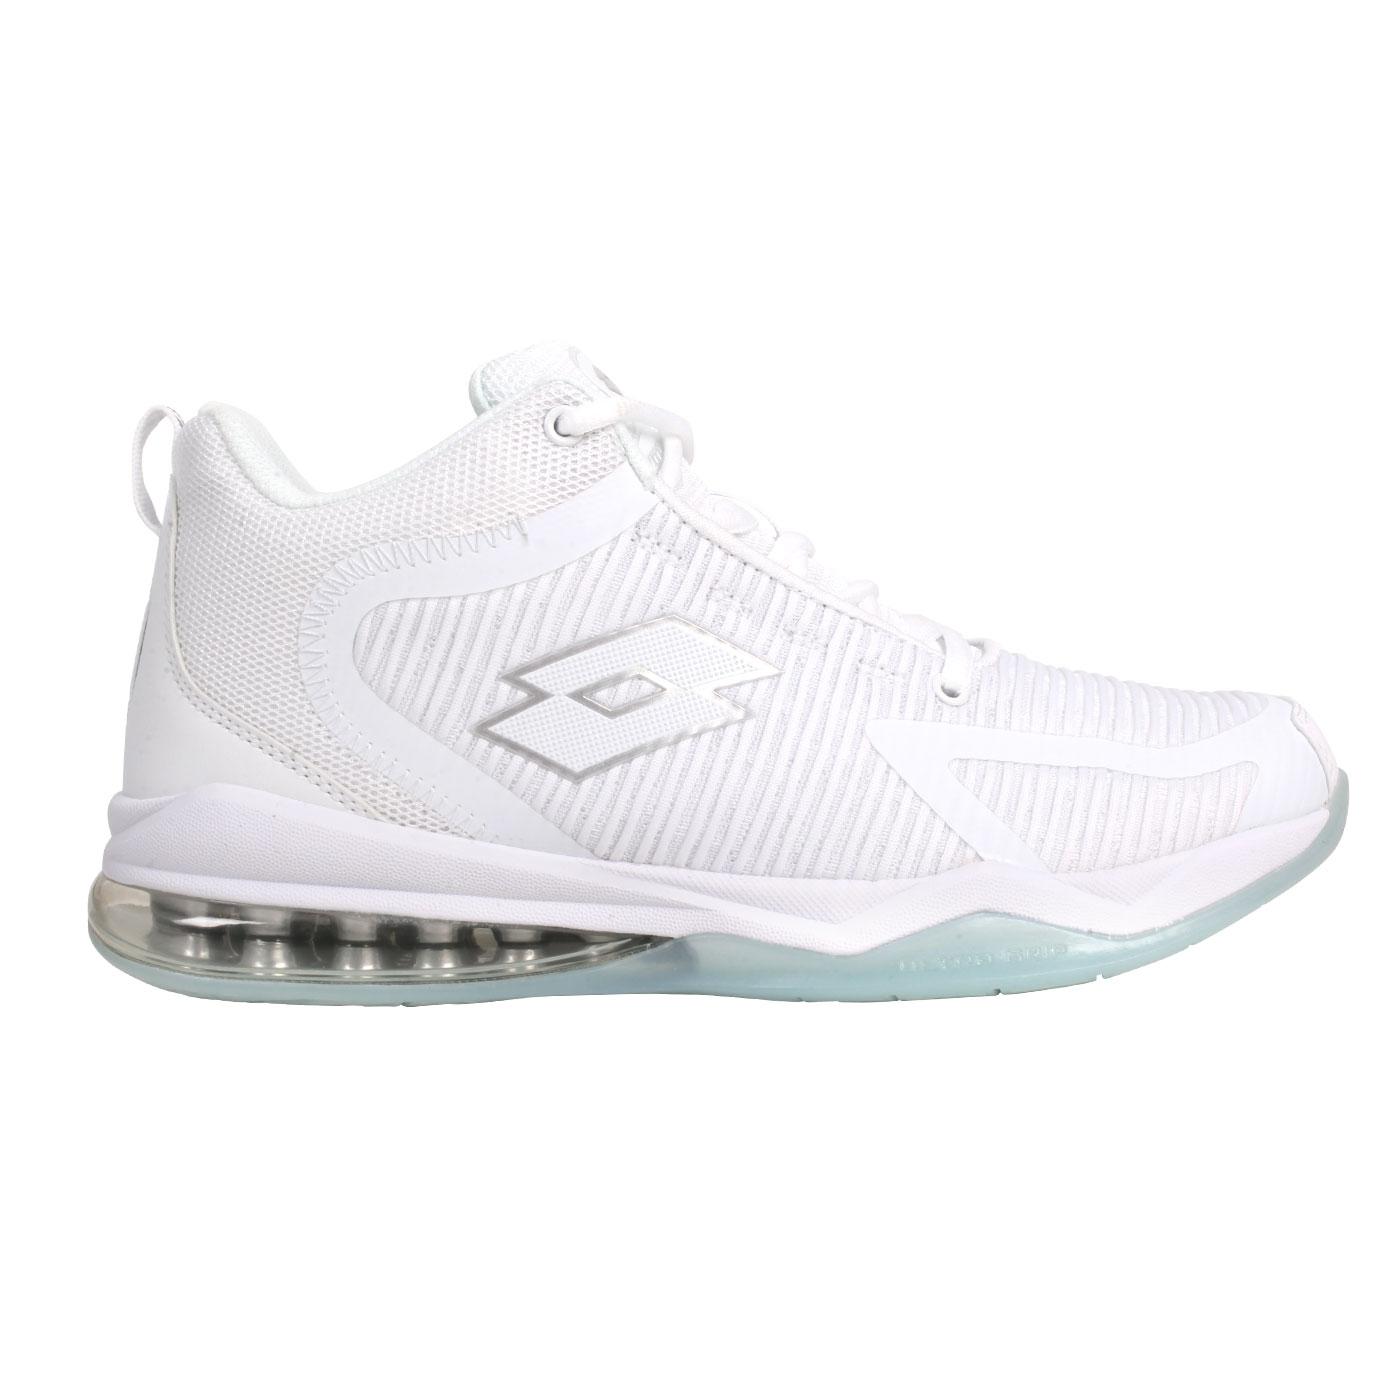 LOTTO 男款氣墊籃球鞋 LT0AMB2739 - 白銀